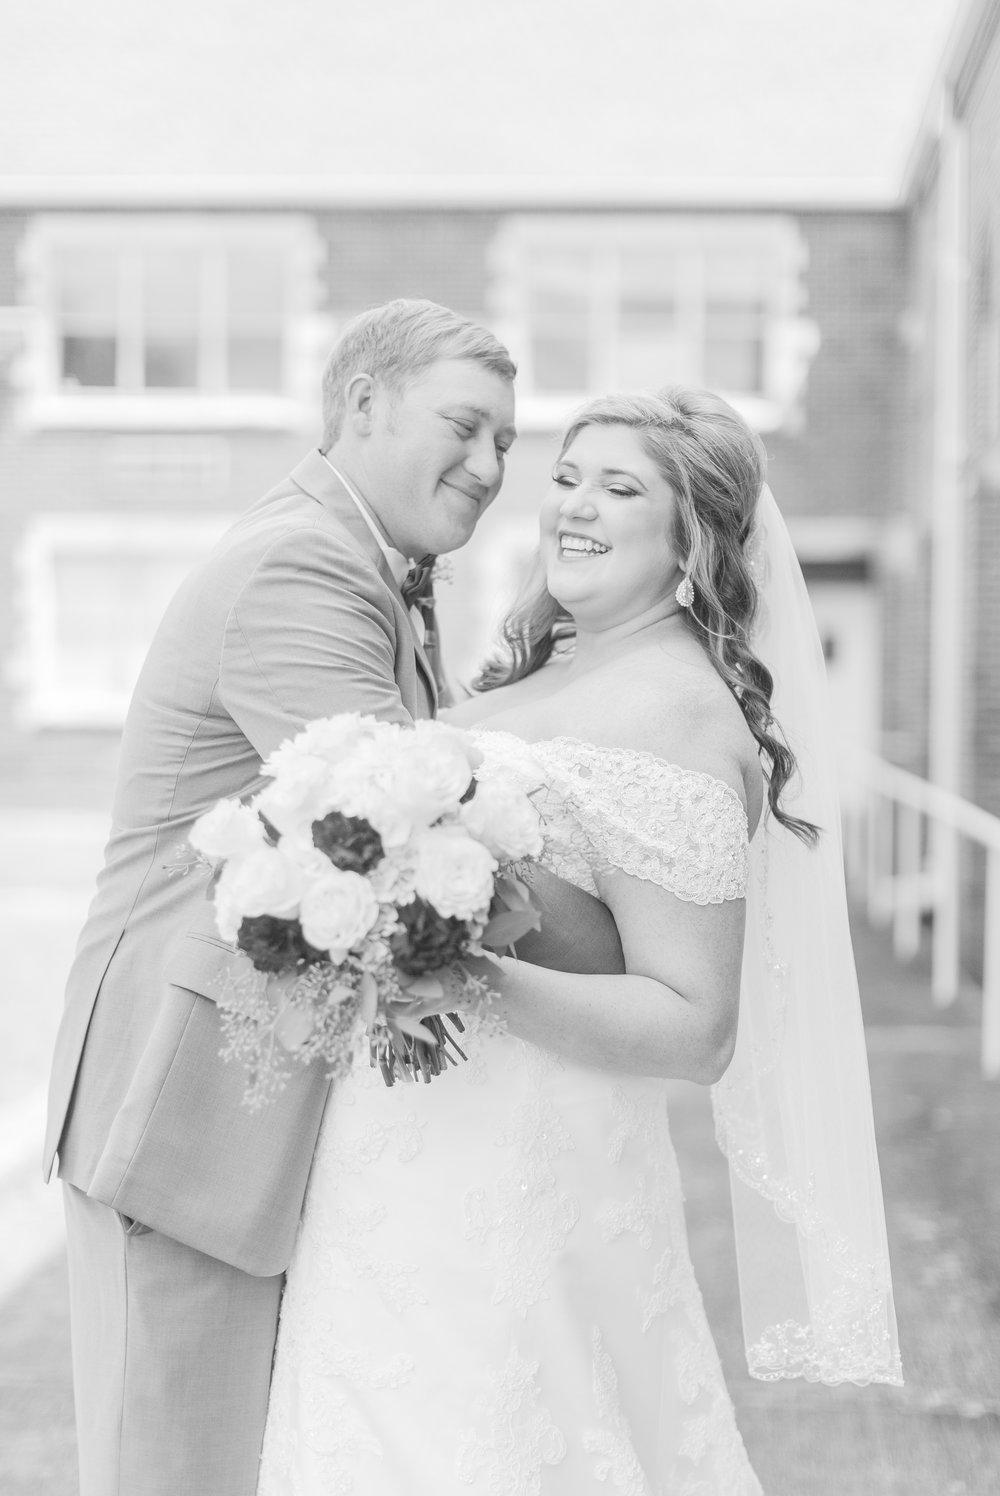 brandon-mississippi-fall-wedding 24.jpg